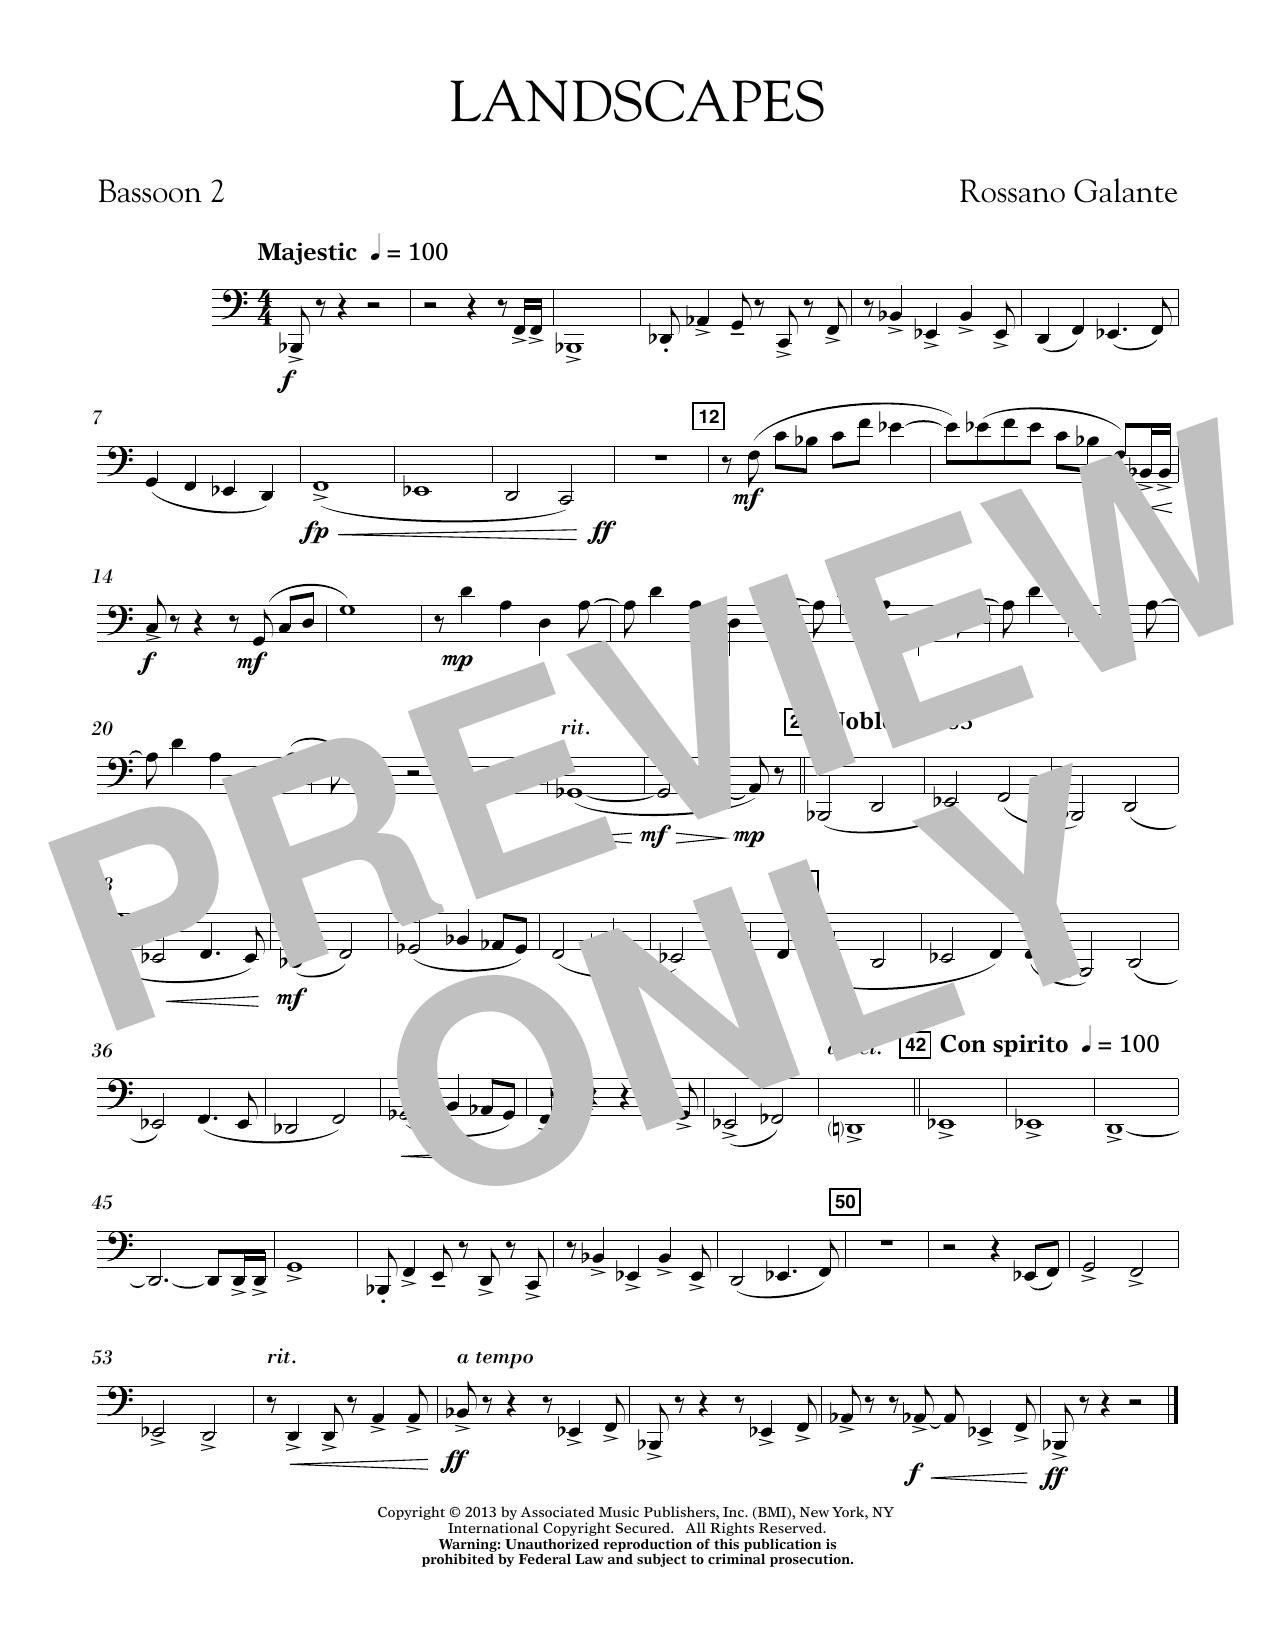 Rosanno Galante Landscapes - Bassoon 2 sheet music notes printable PDF score